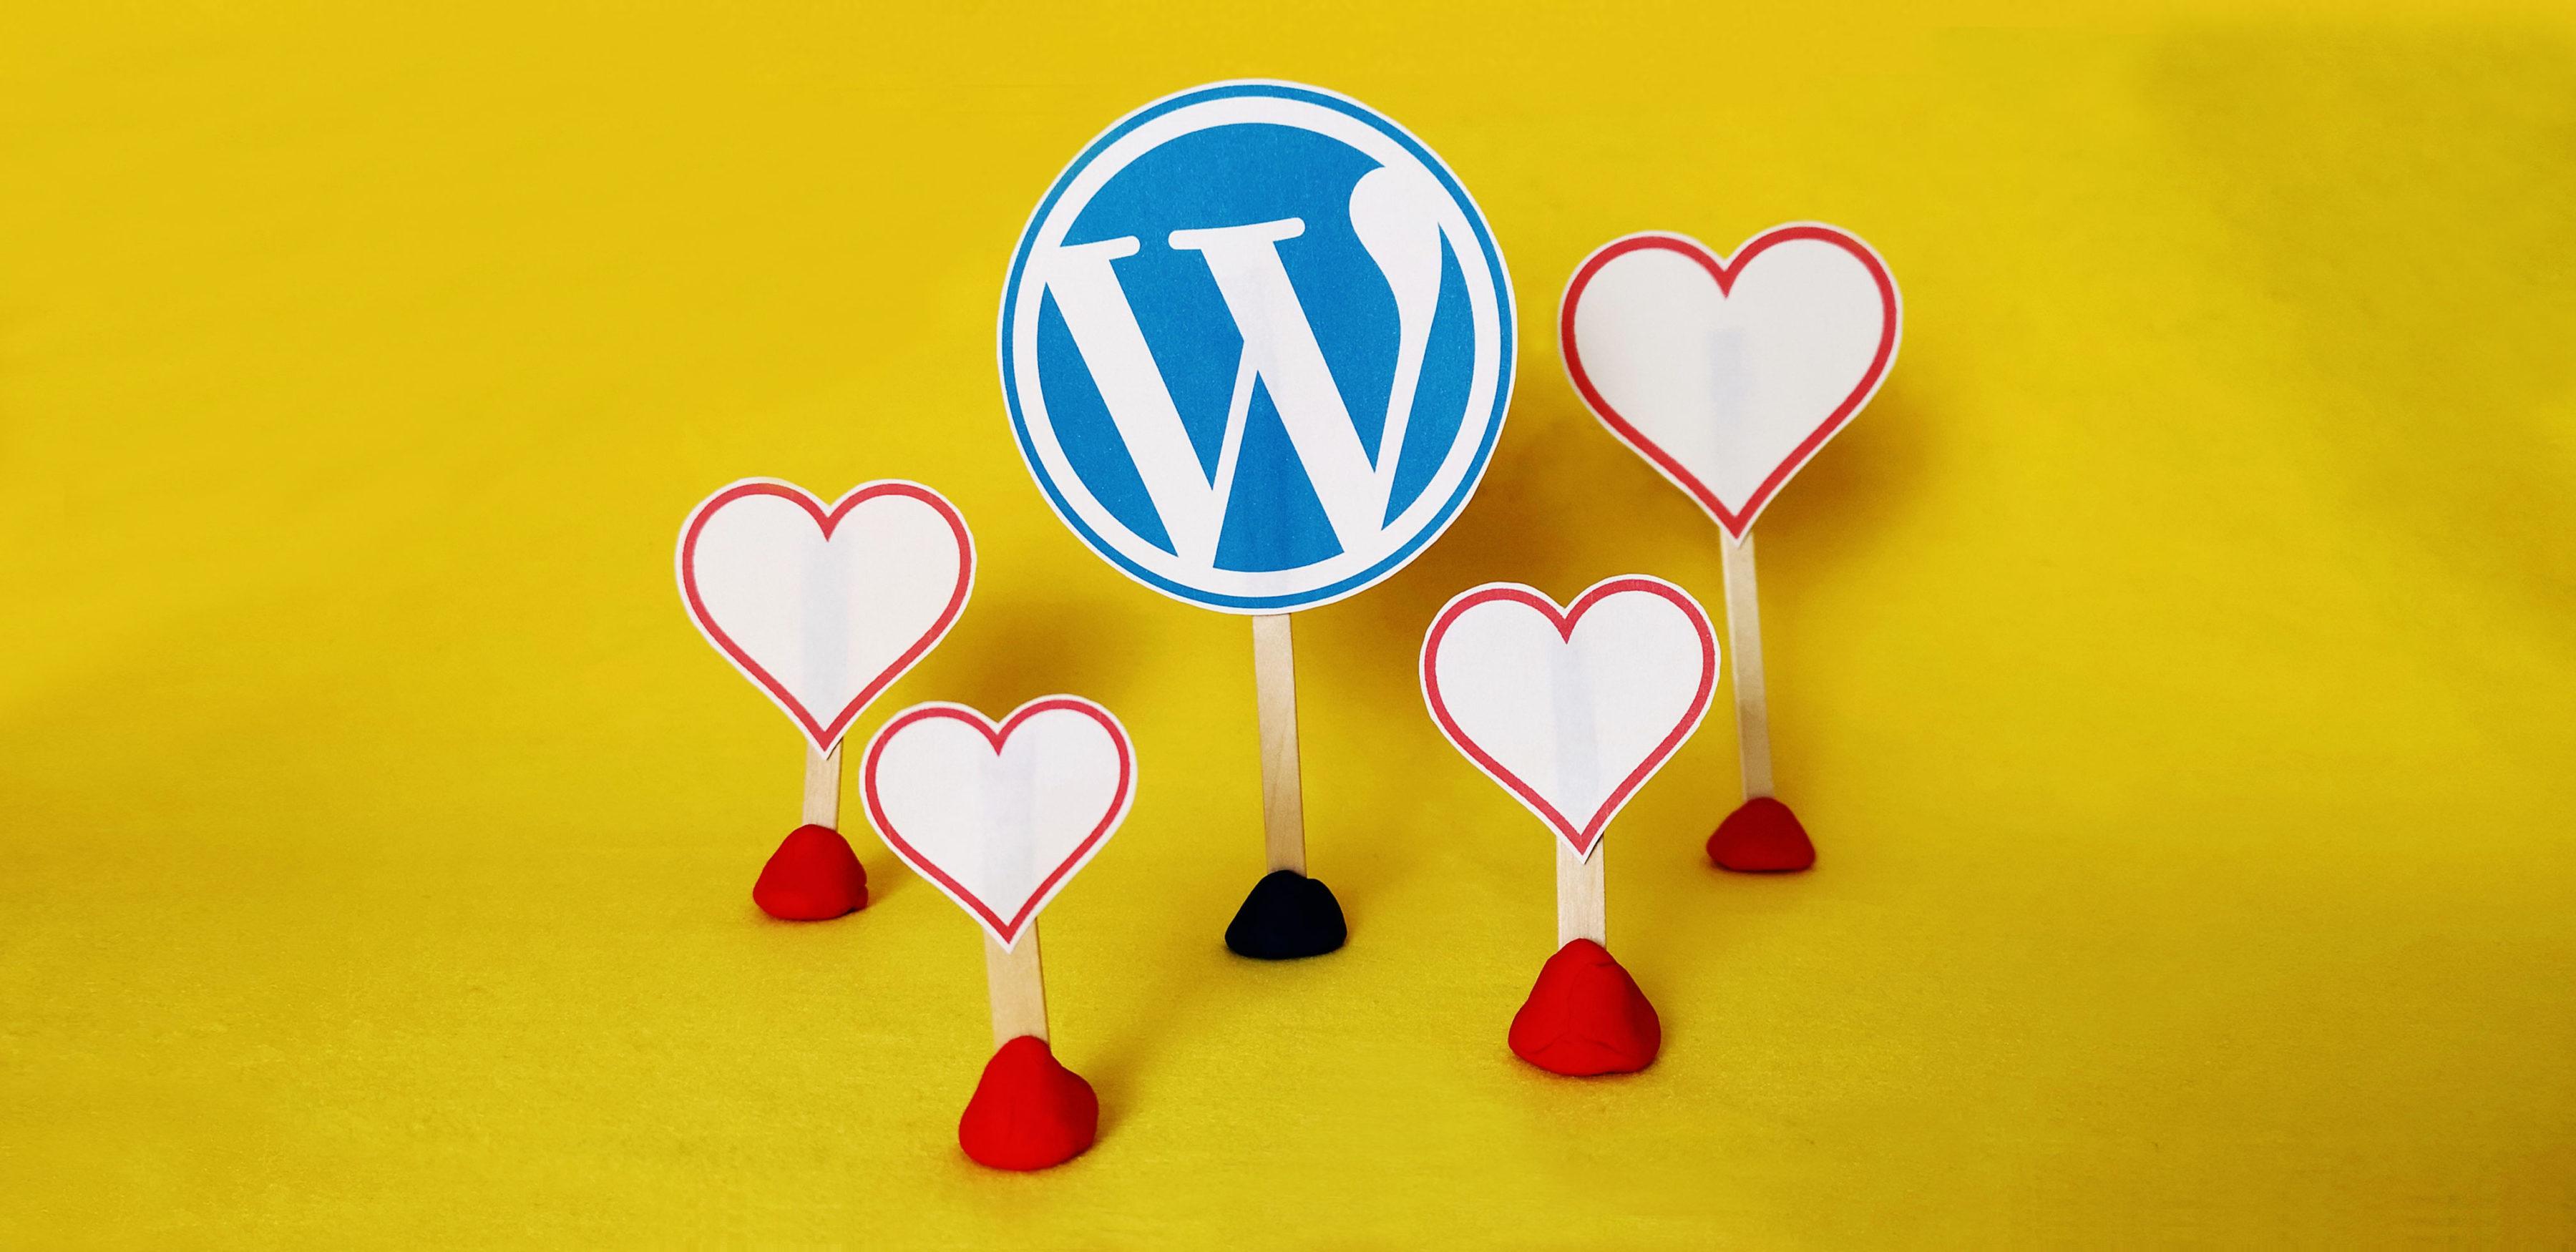 Wordpress logo with hearts around it